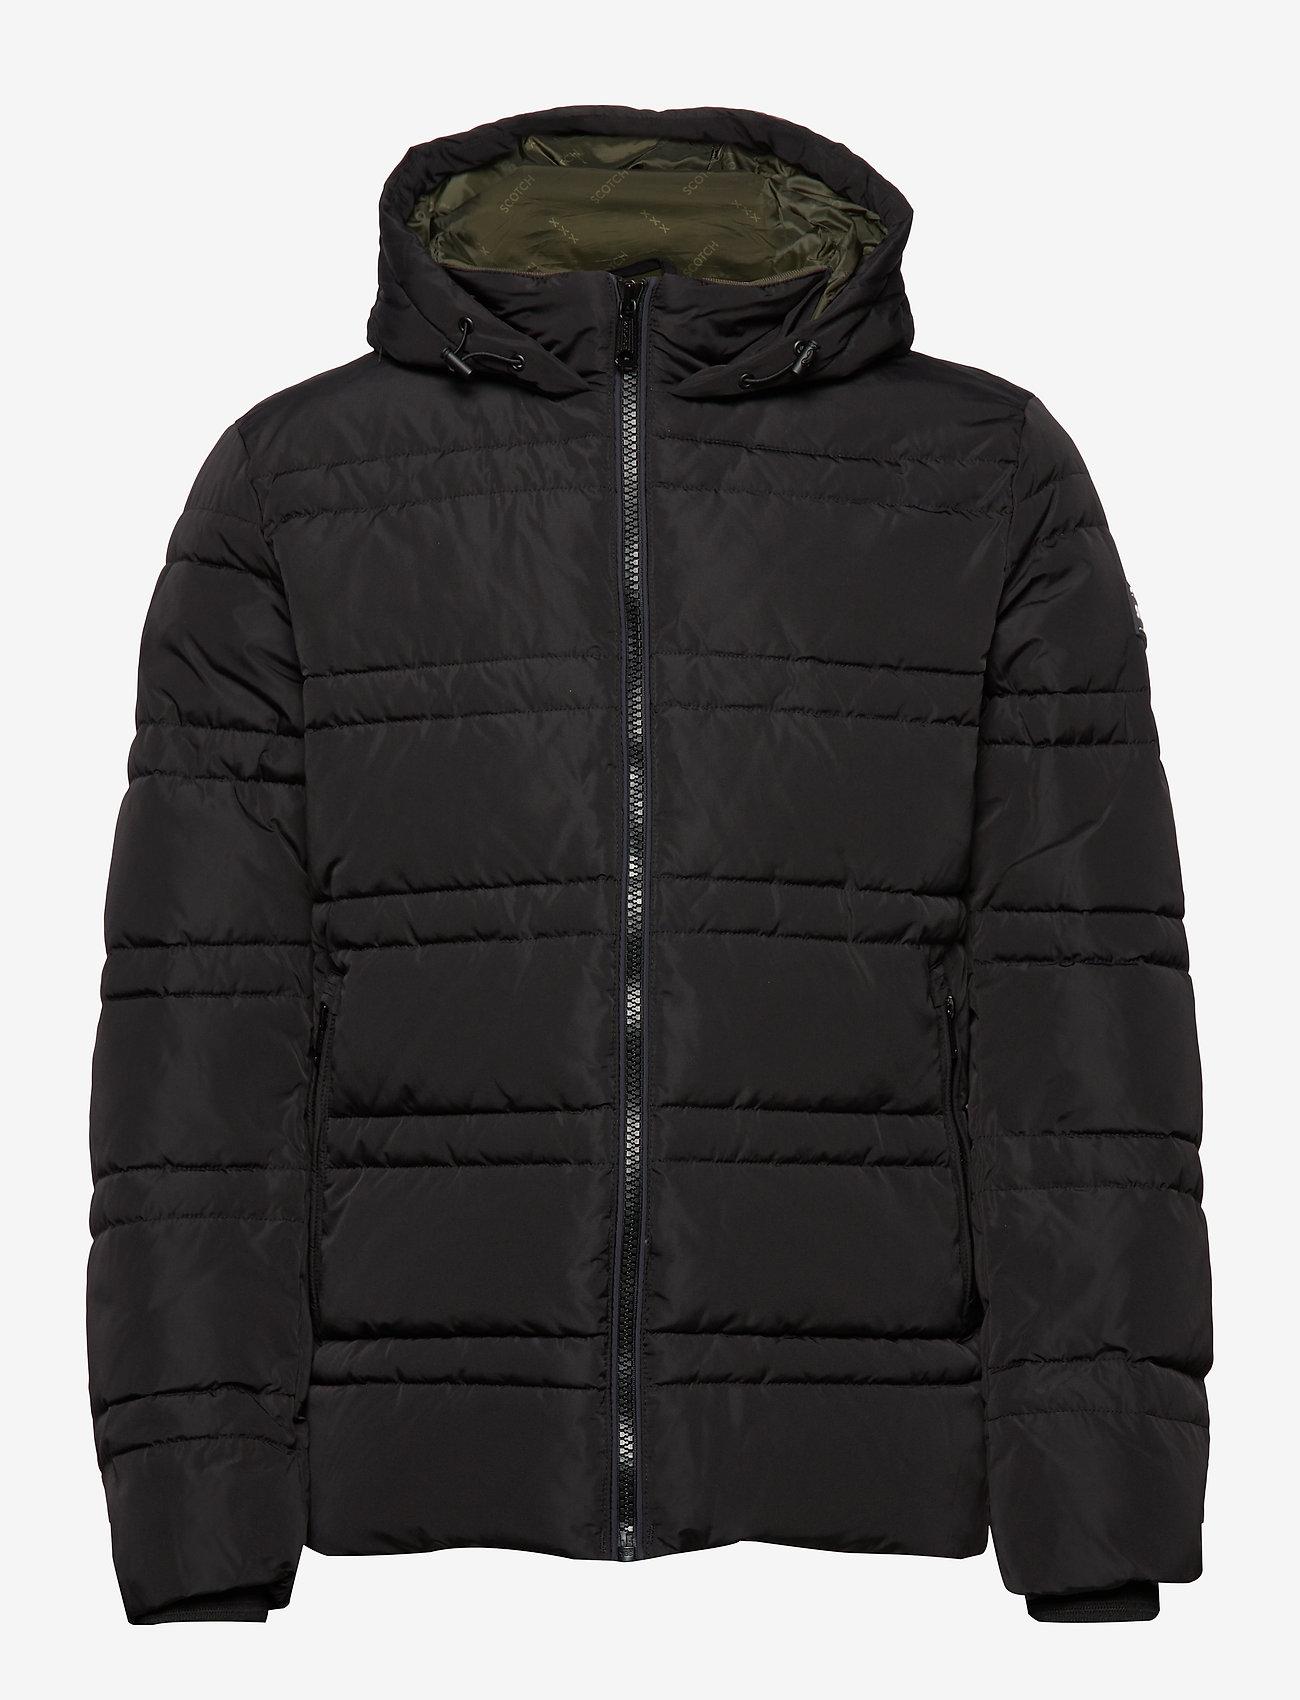 Scotch & Soda - Classic hooded PrimaLoft jacket - vestes matelassées - black - 1